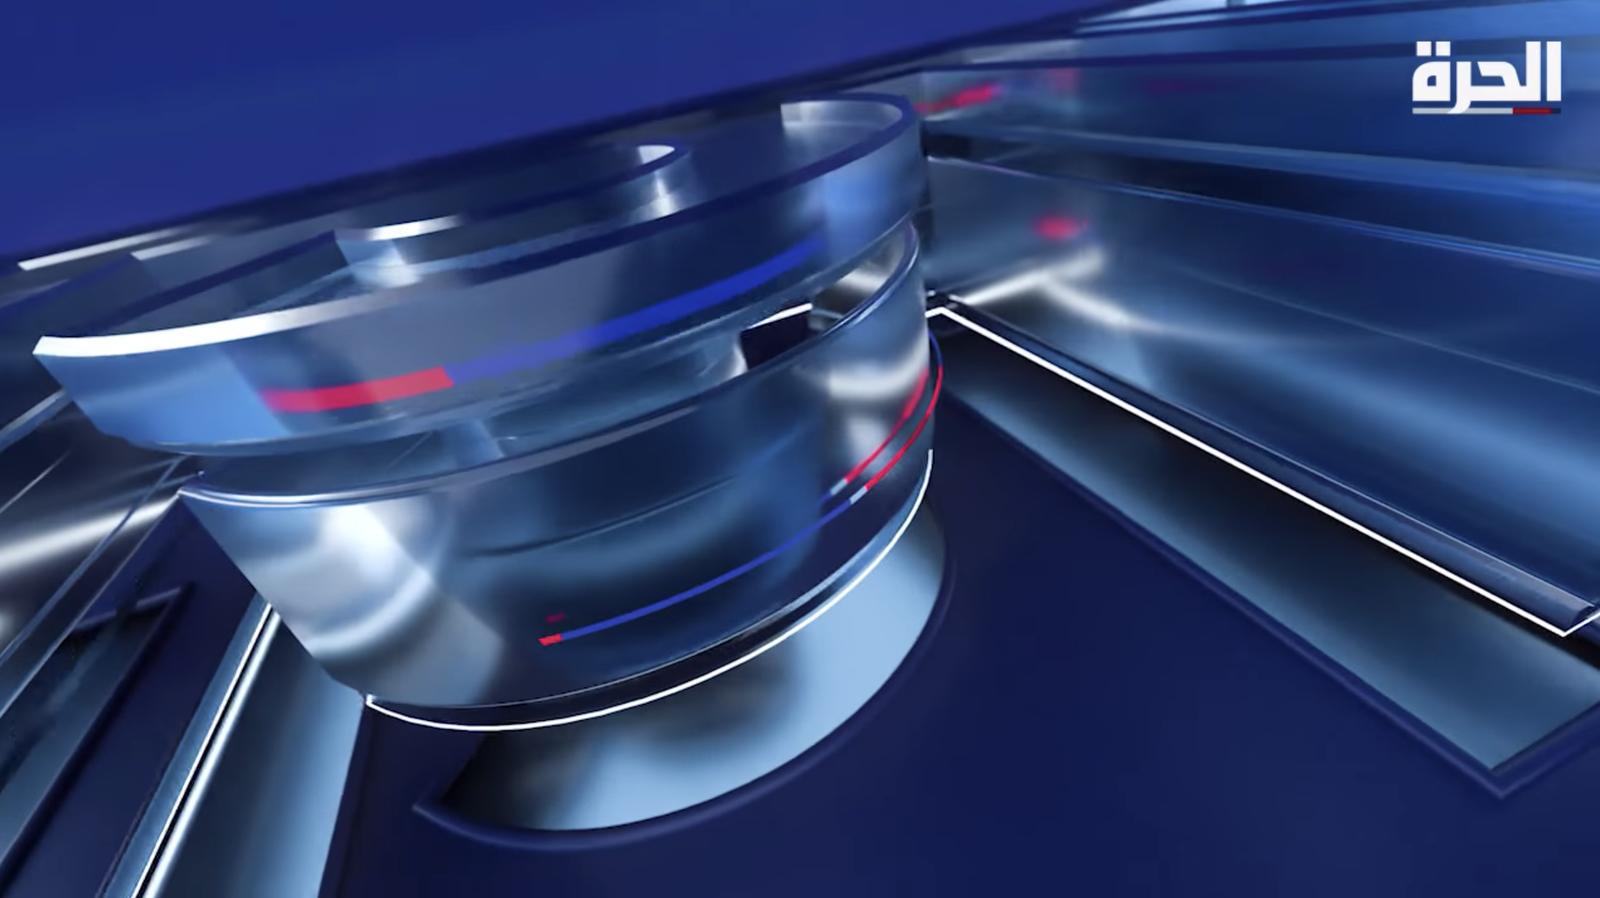 NCS_Alhurra_broadcast-design_0006